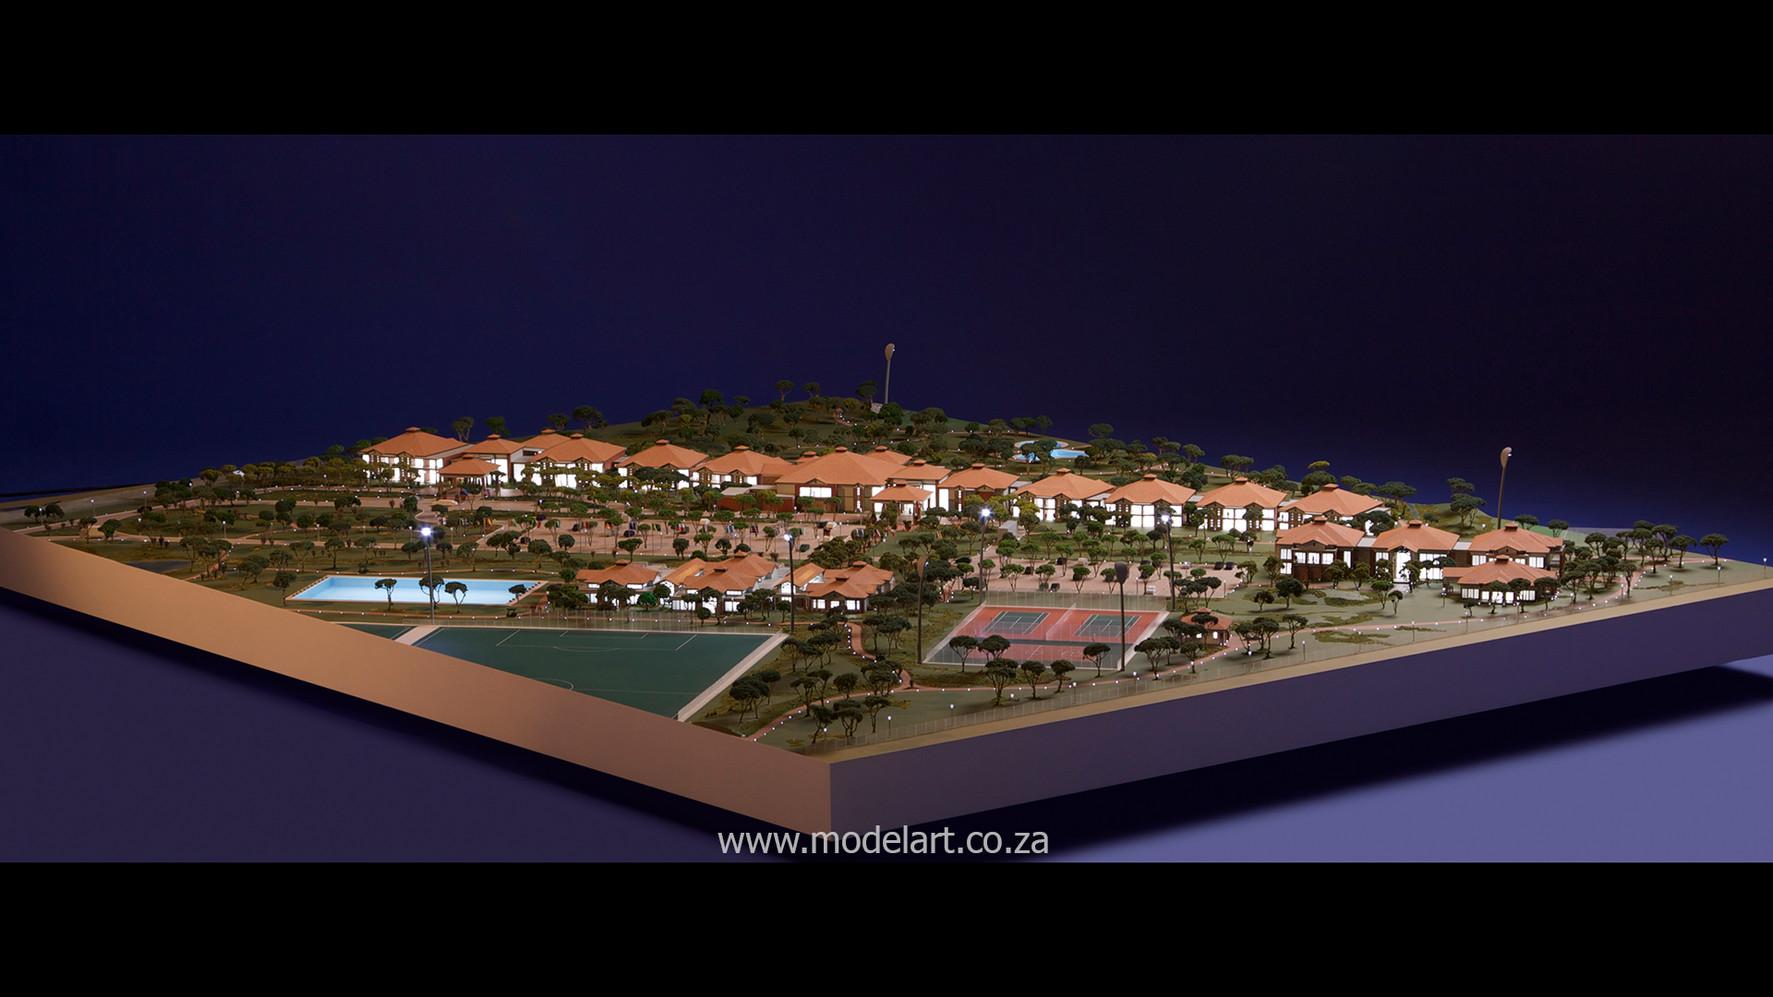 Architectural-Scale-Model-Sports Facilities-Royal Bafokeng Campus 2-2